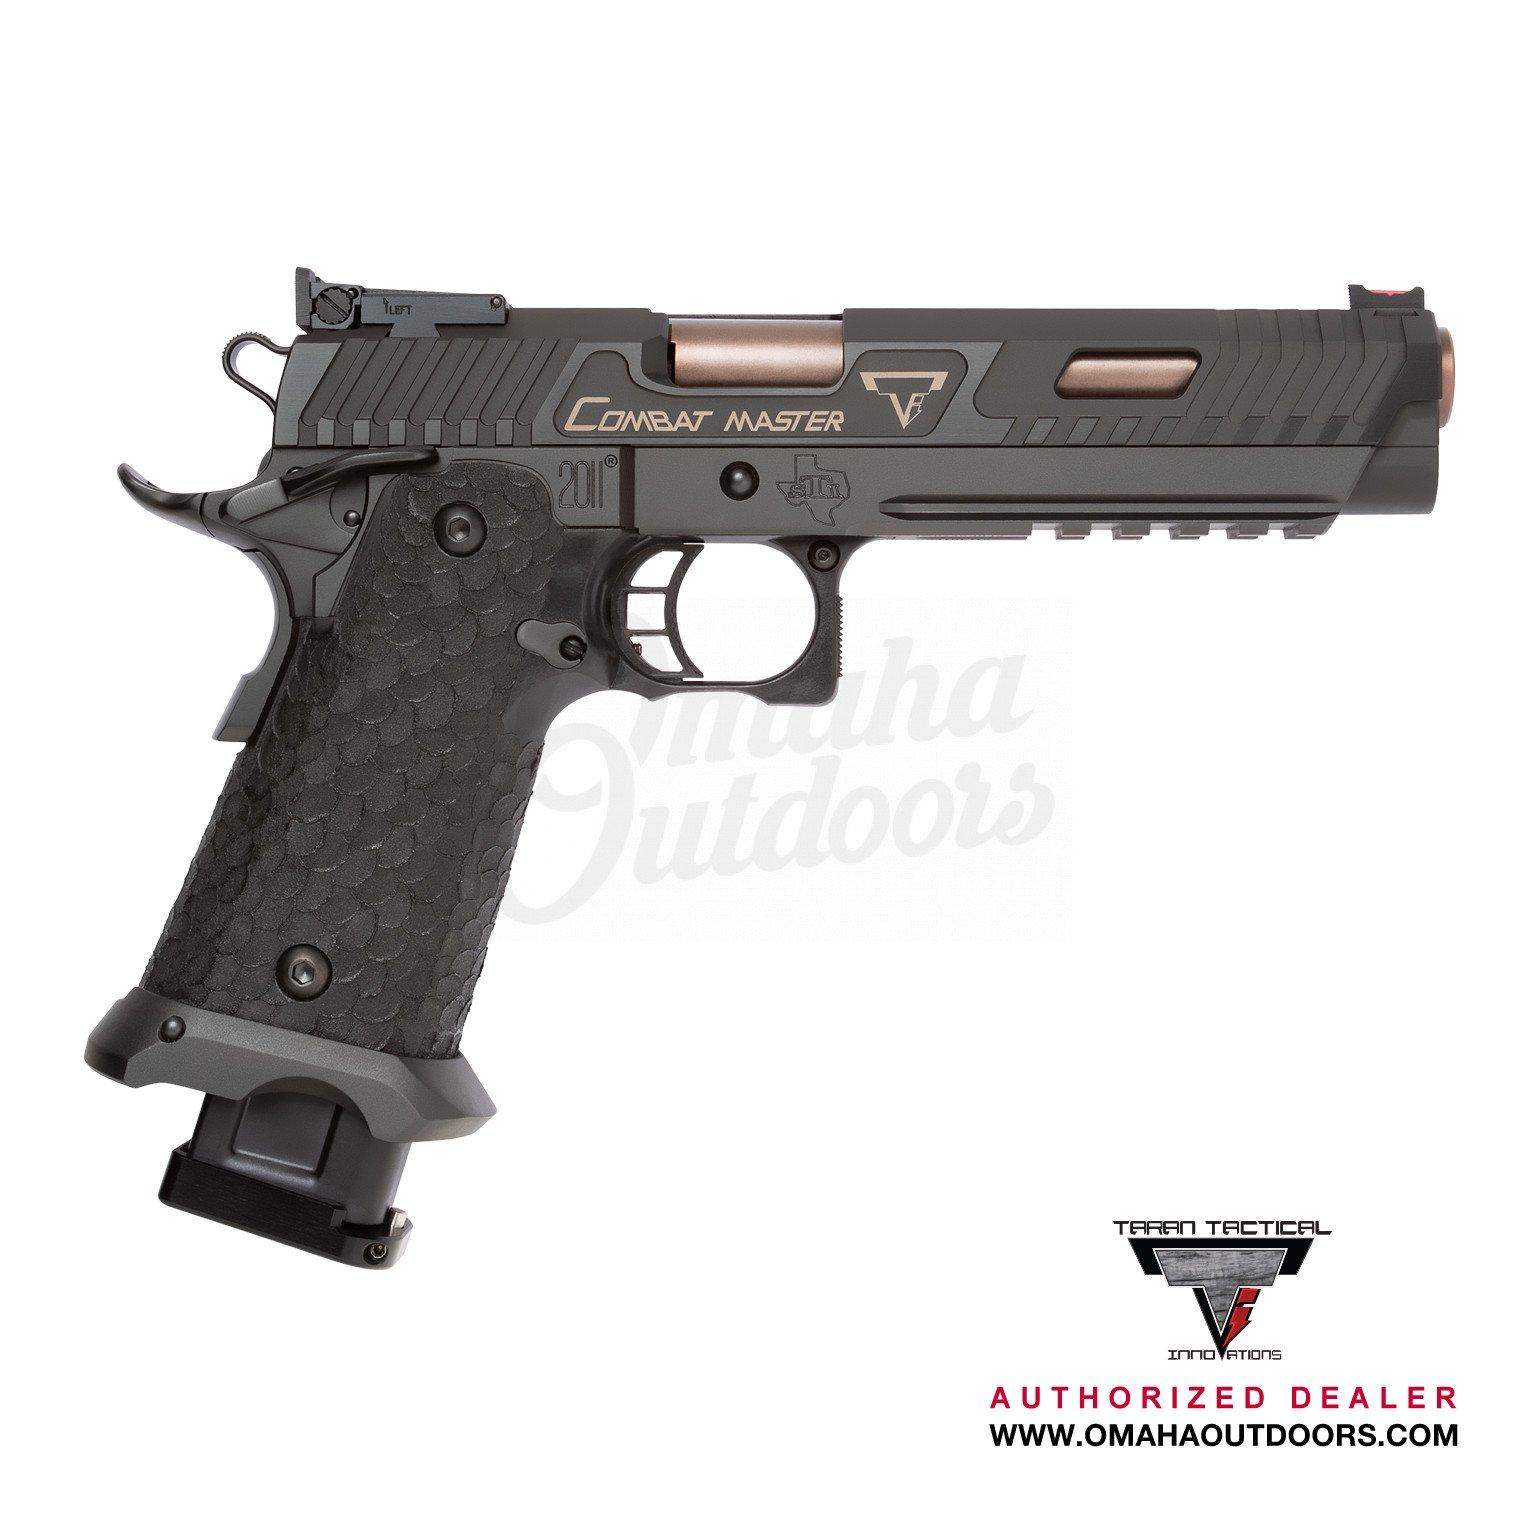 Taran Tactical John Wick 3 Sti Combat Master 2011 Pistol